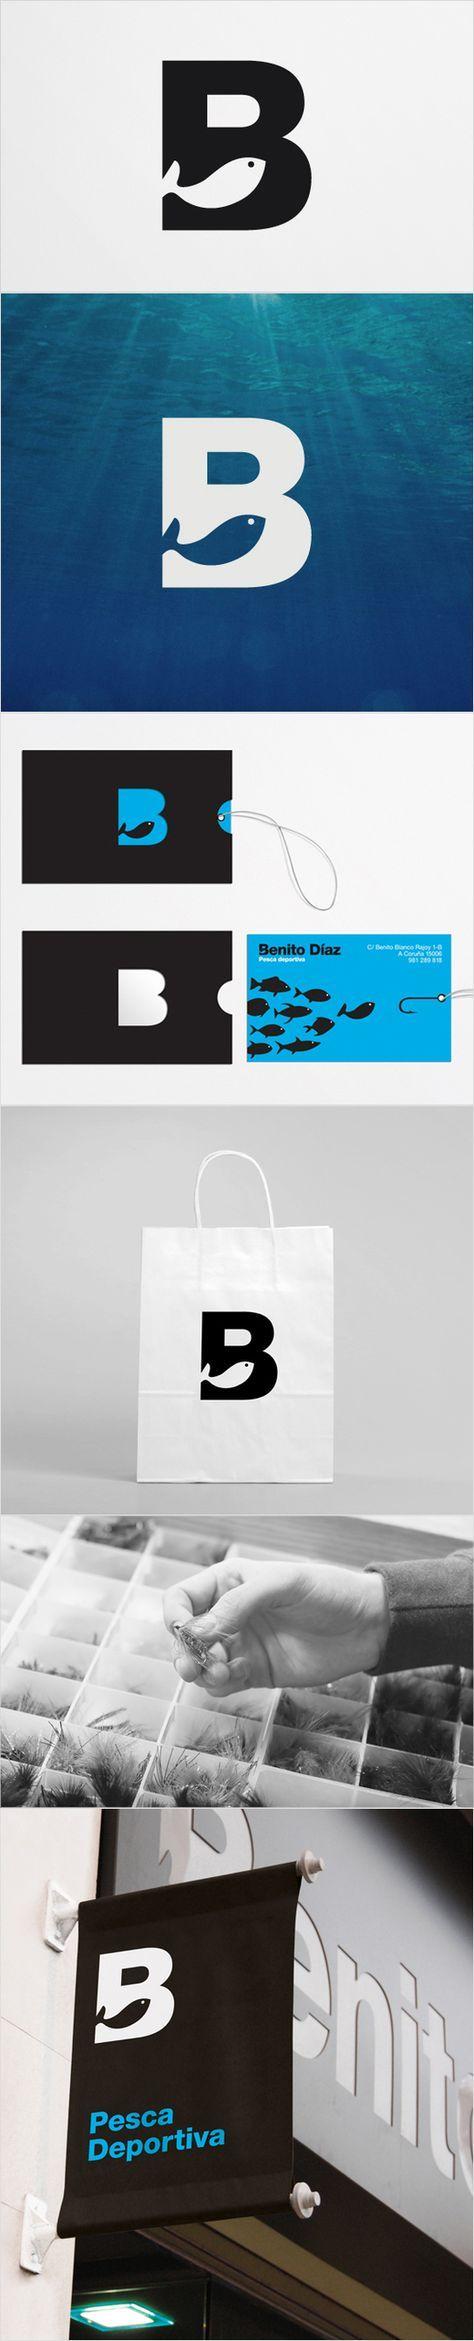 "Sport Fishing Logo: Benito Díaz - David de la Fuente <a href=""http://www.daviddelafuente.com"" rel=""nofollow"" target=""_blank"">www.daviddelafuen...</a>"